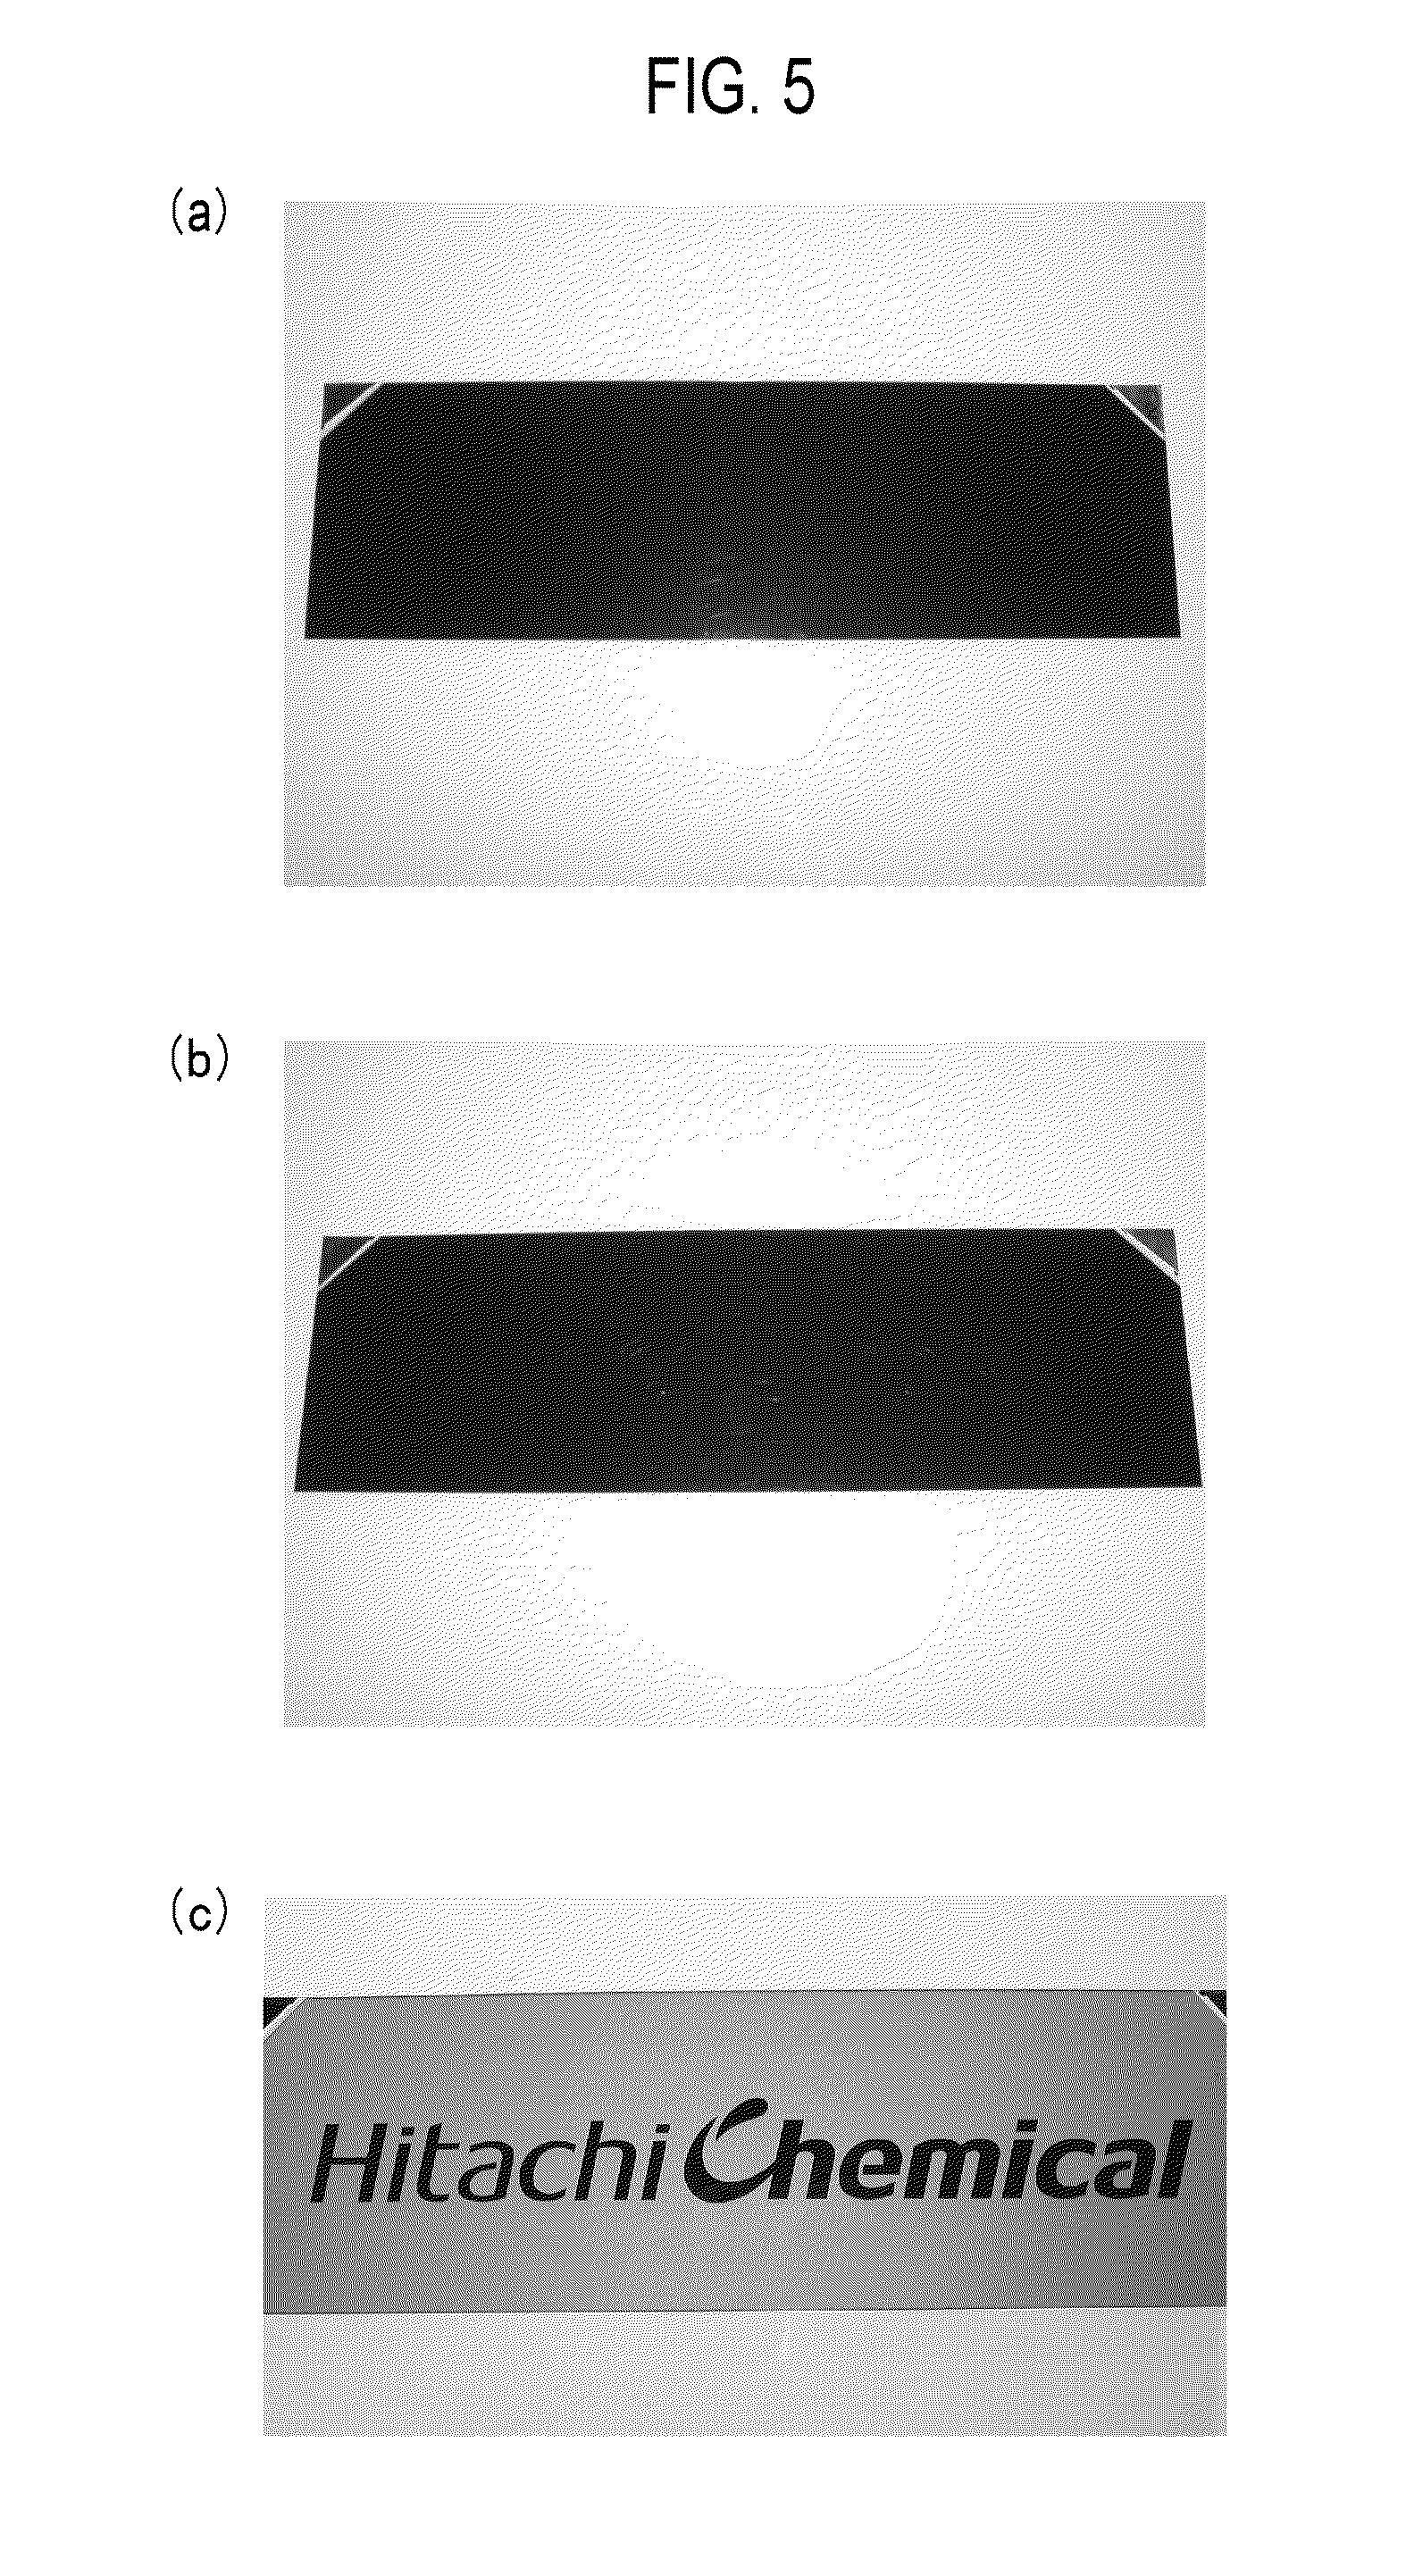 US8687263B2 - Light control film - Google Patents